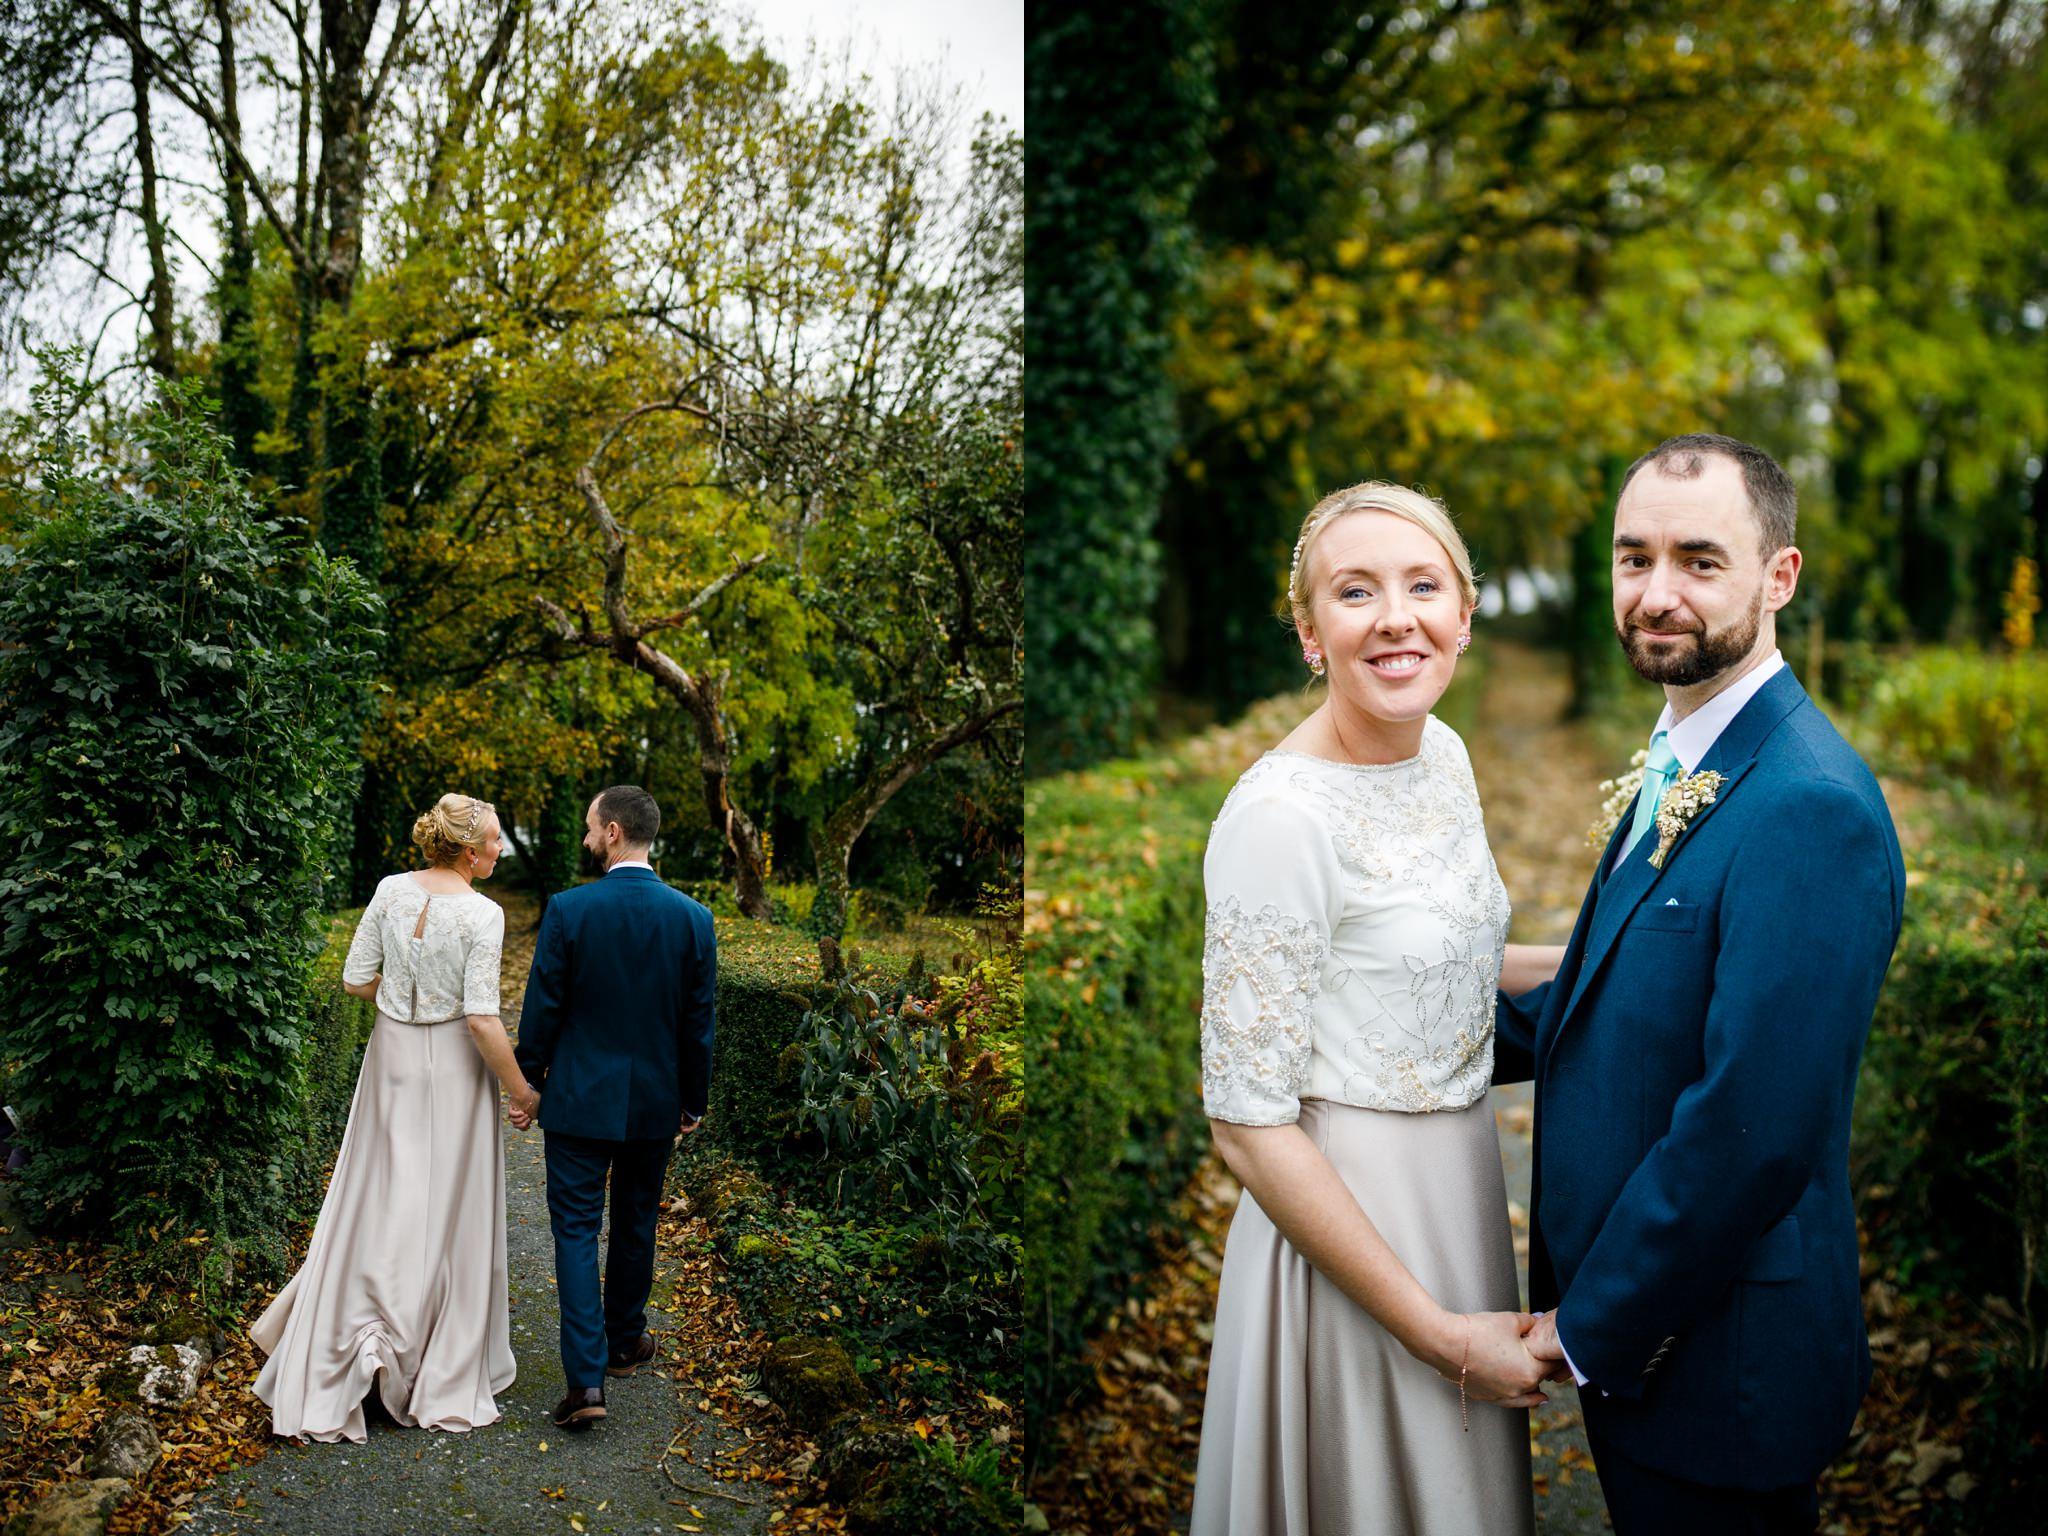 Elisha-Clarke-Photography-Dublin-City-Wedding_0094.jpg